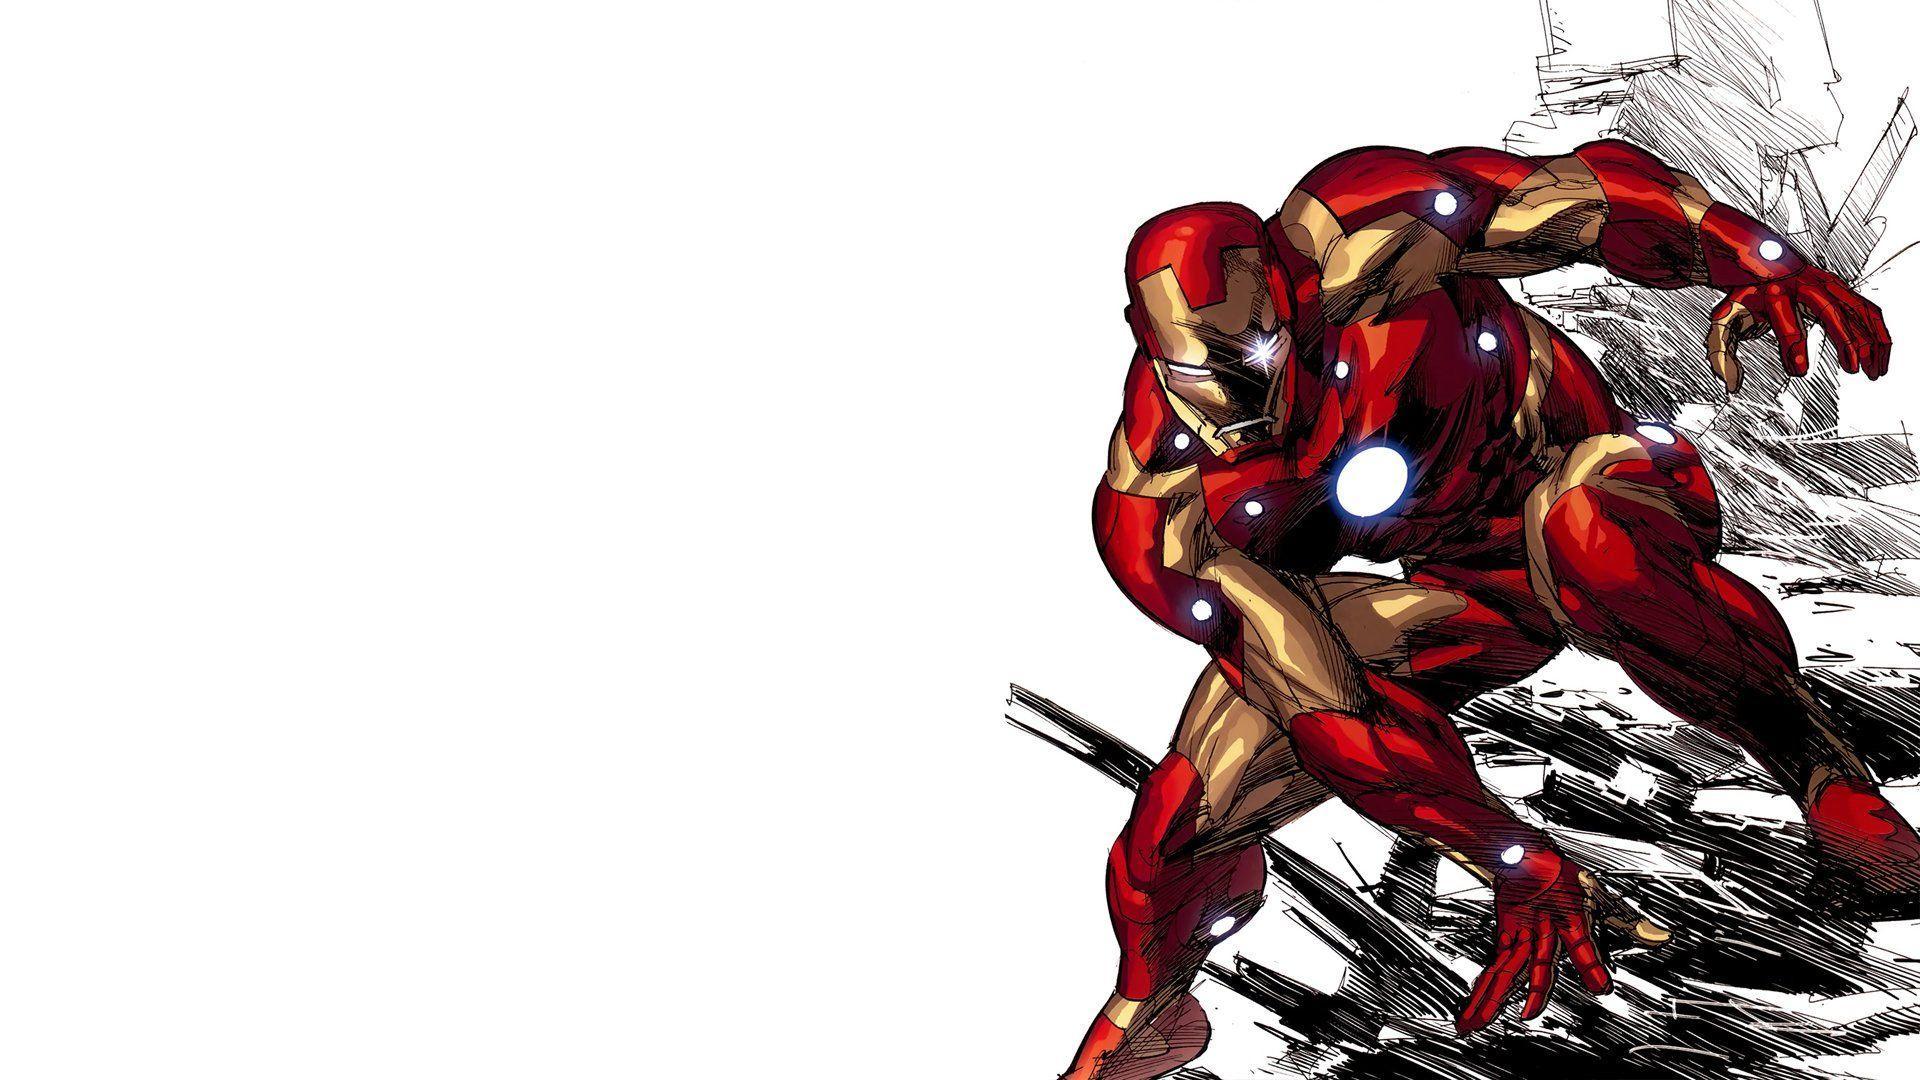 Iron Man comic cartoon wallpapers - wallpaper.wiki